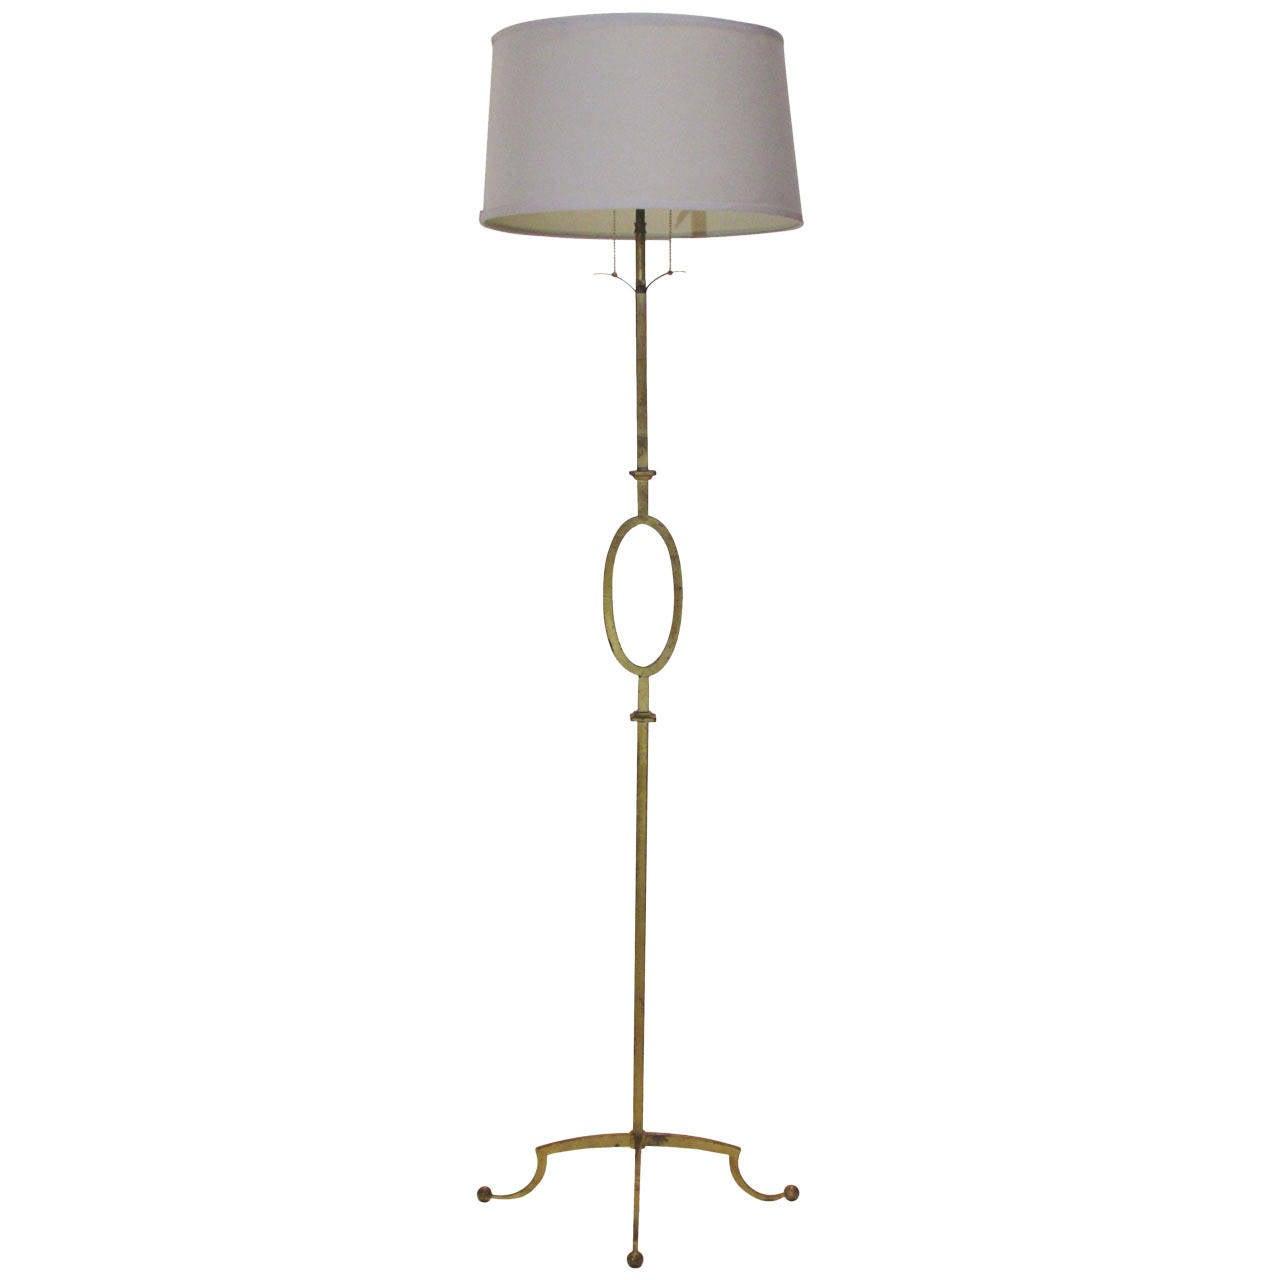 Gilded Iron Floor Lamp Poillerat